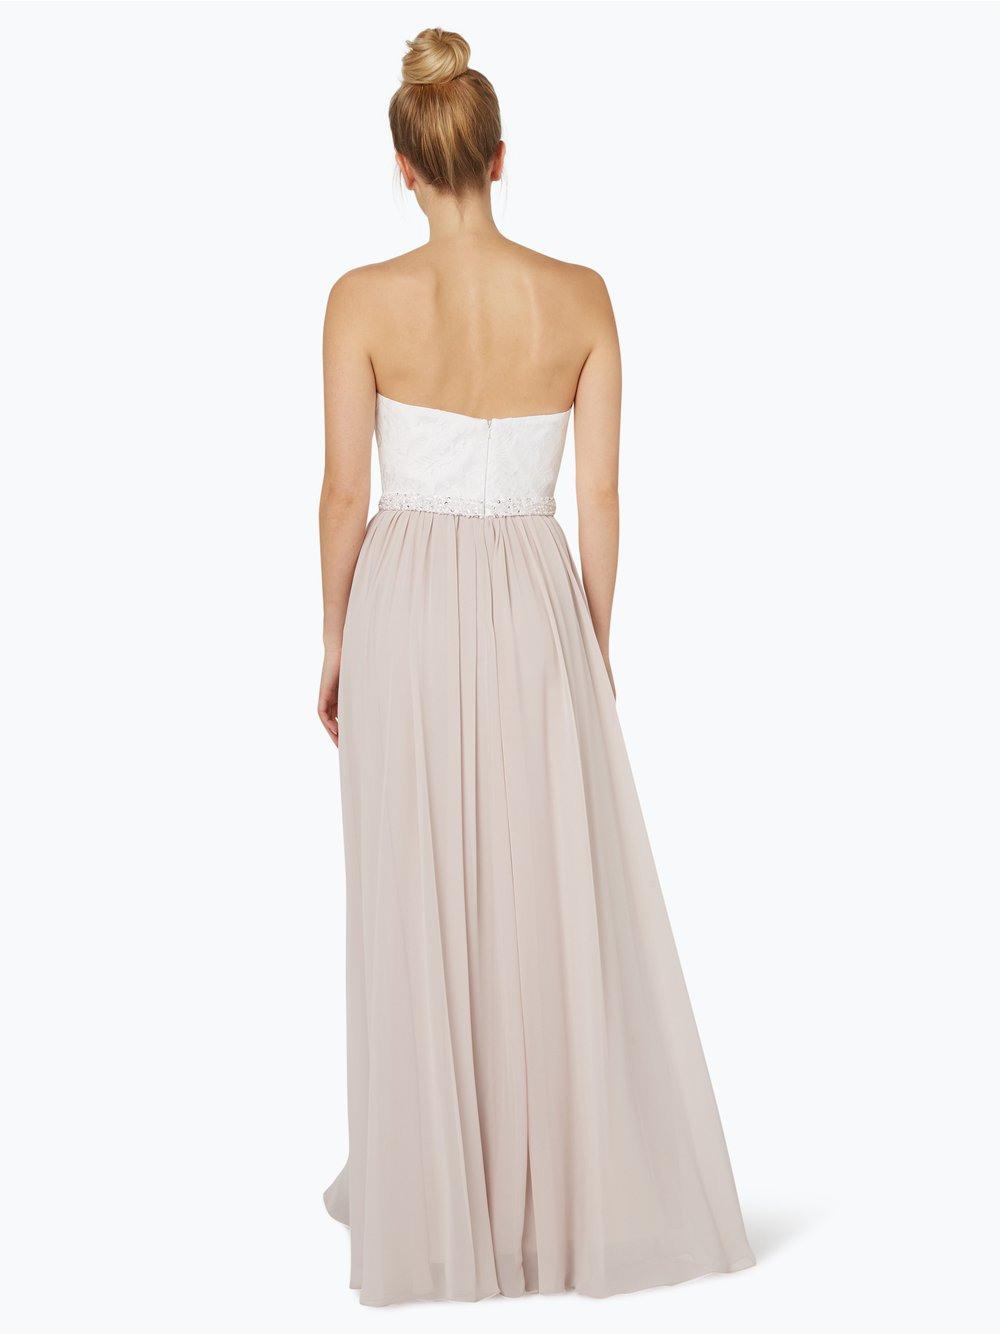 Formal Luxurius Unique Damen Abendkleid Spezialgebiet17 Cool Unique Damen Abendkleid für 2019